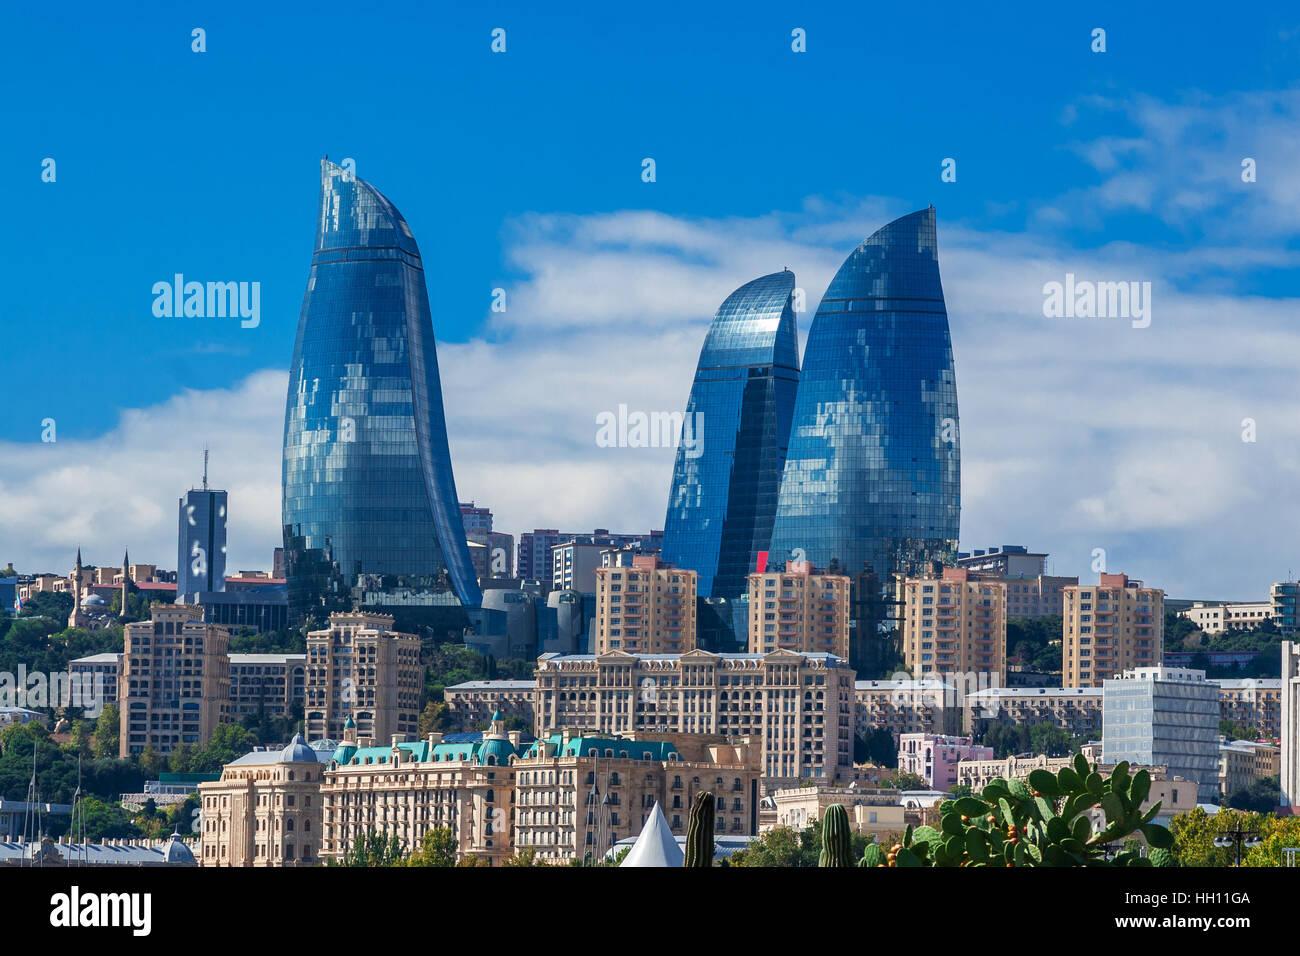 Baku, Azerbaijan - October 2, 2016: Flame towers in the cityscape. Panoramic view of Baku - the capital of Azerbaijan Stock Photo